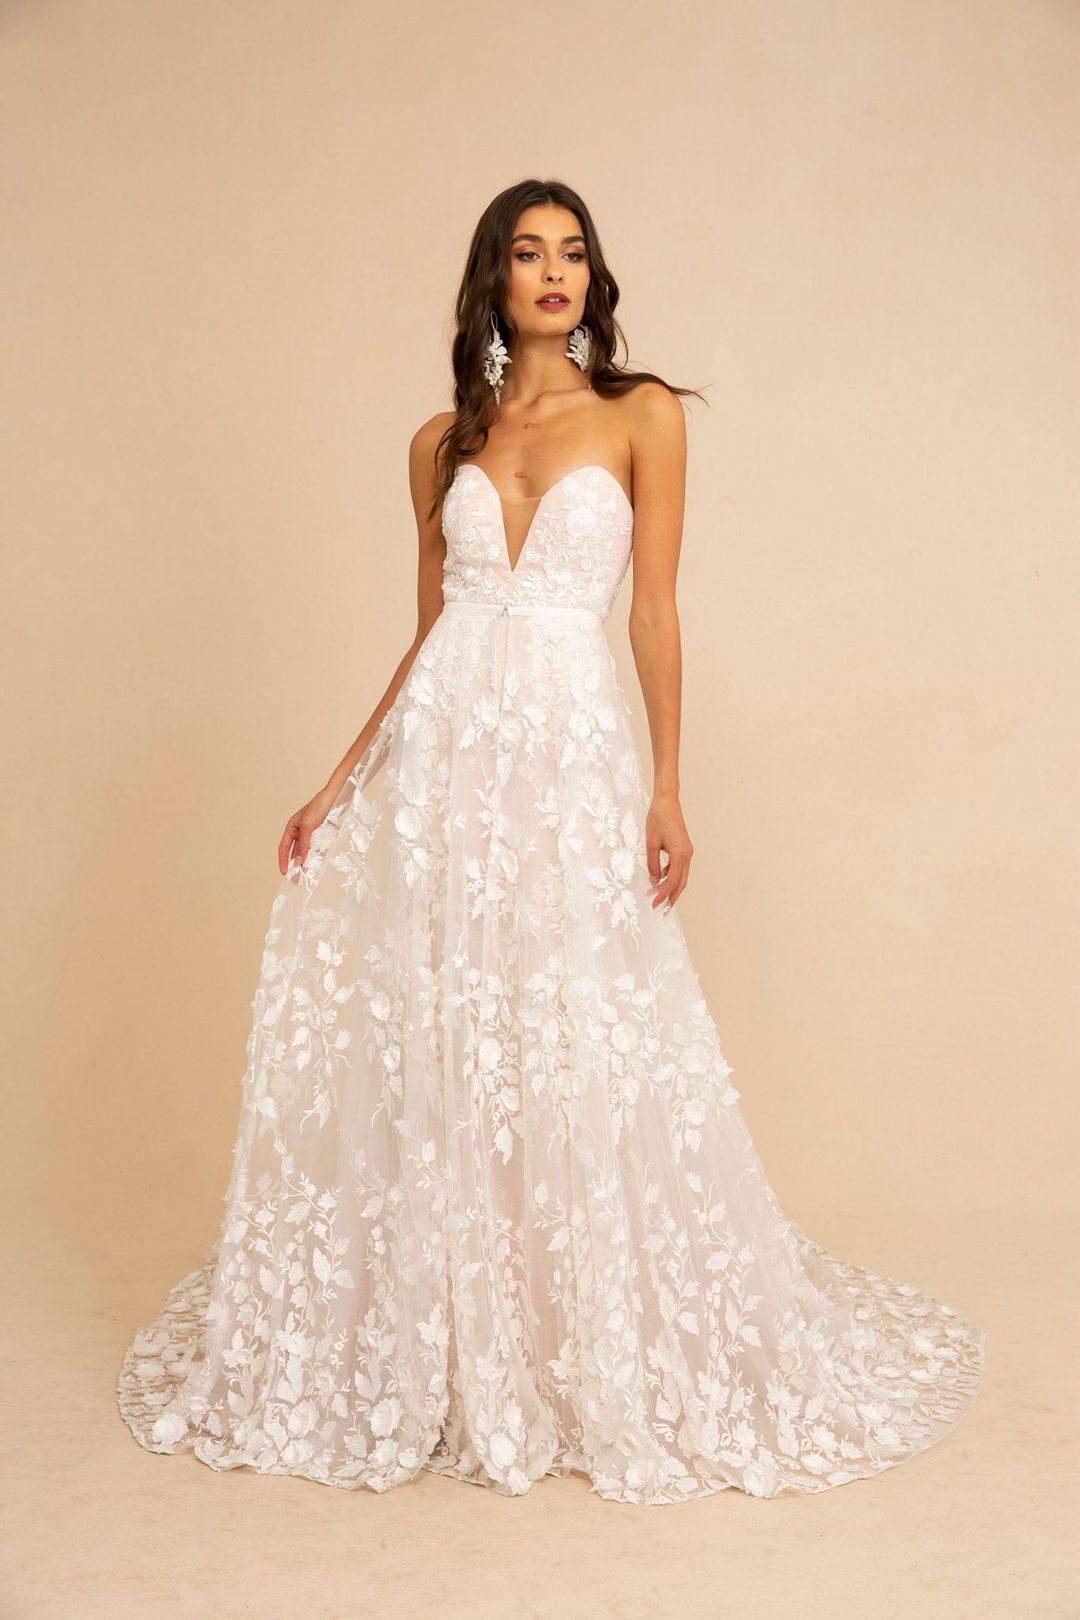 Dress main 2x 1548938221